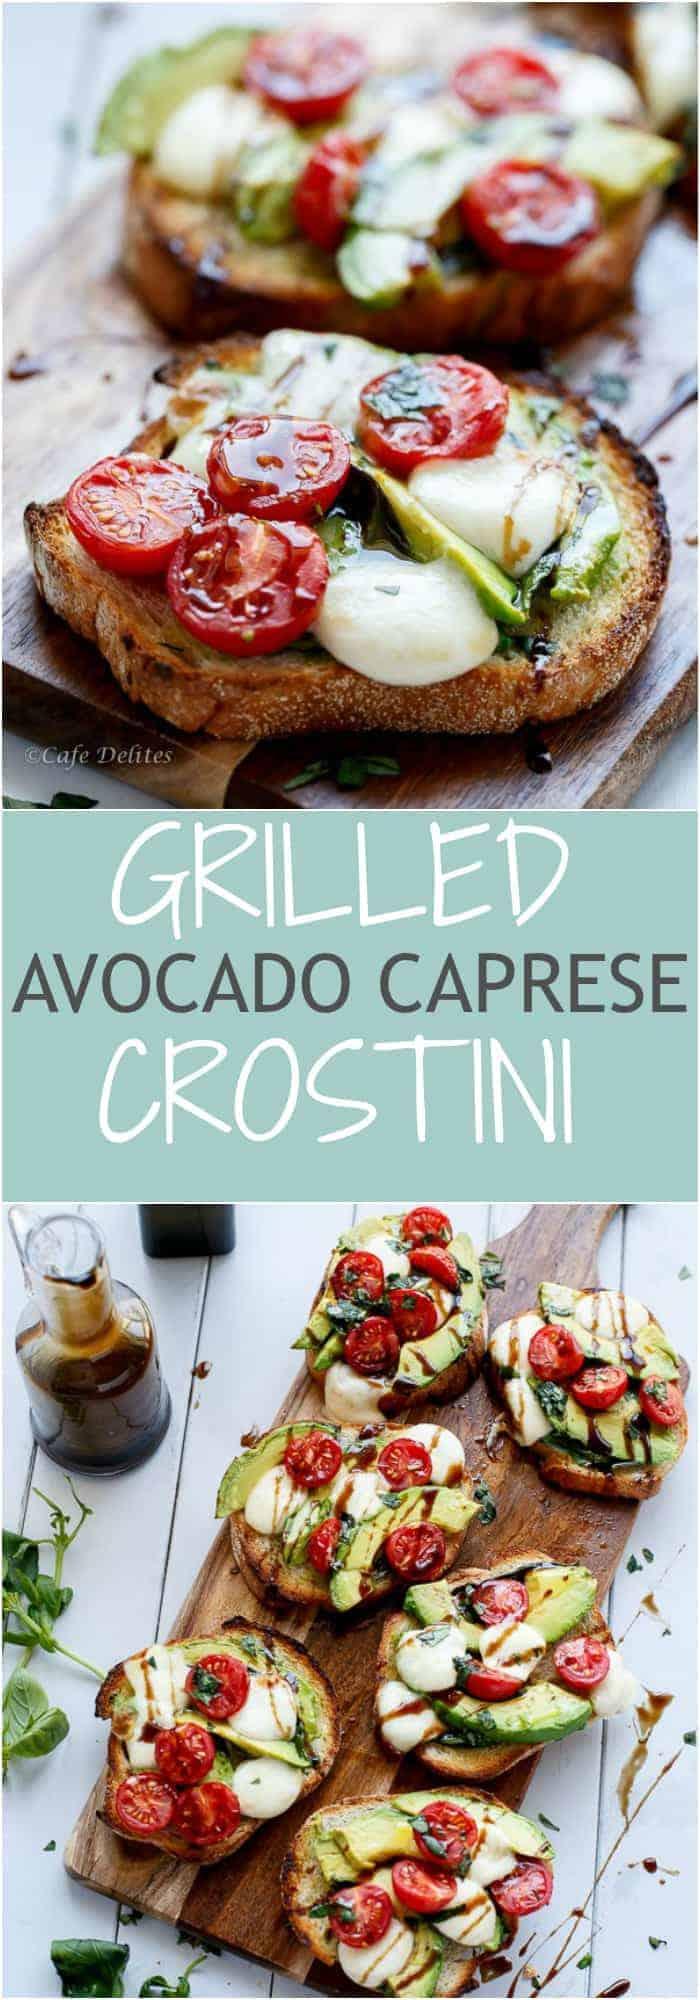 Grilled Avocado Caprese Crostini Collage | http://cafedelites.com